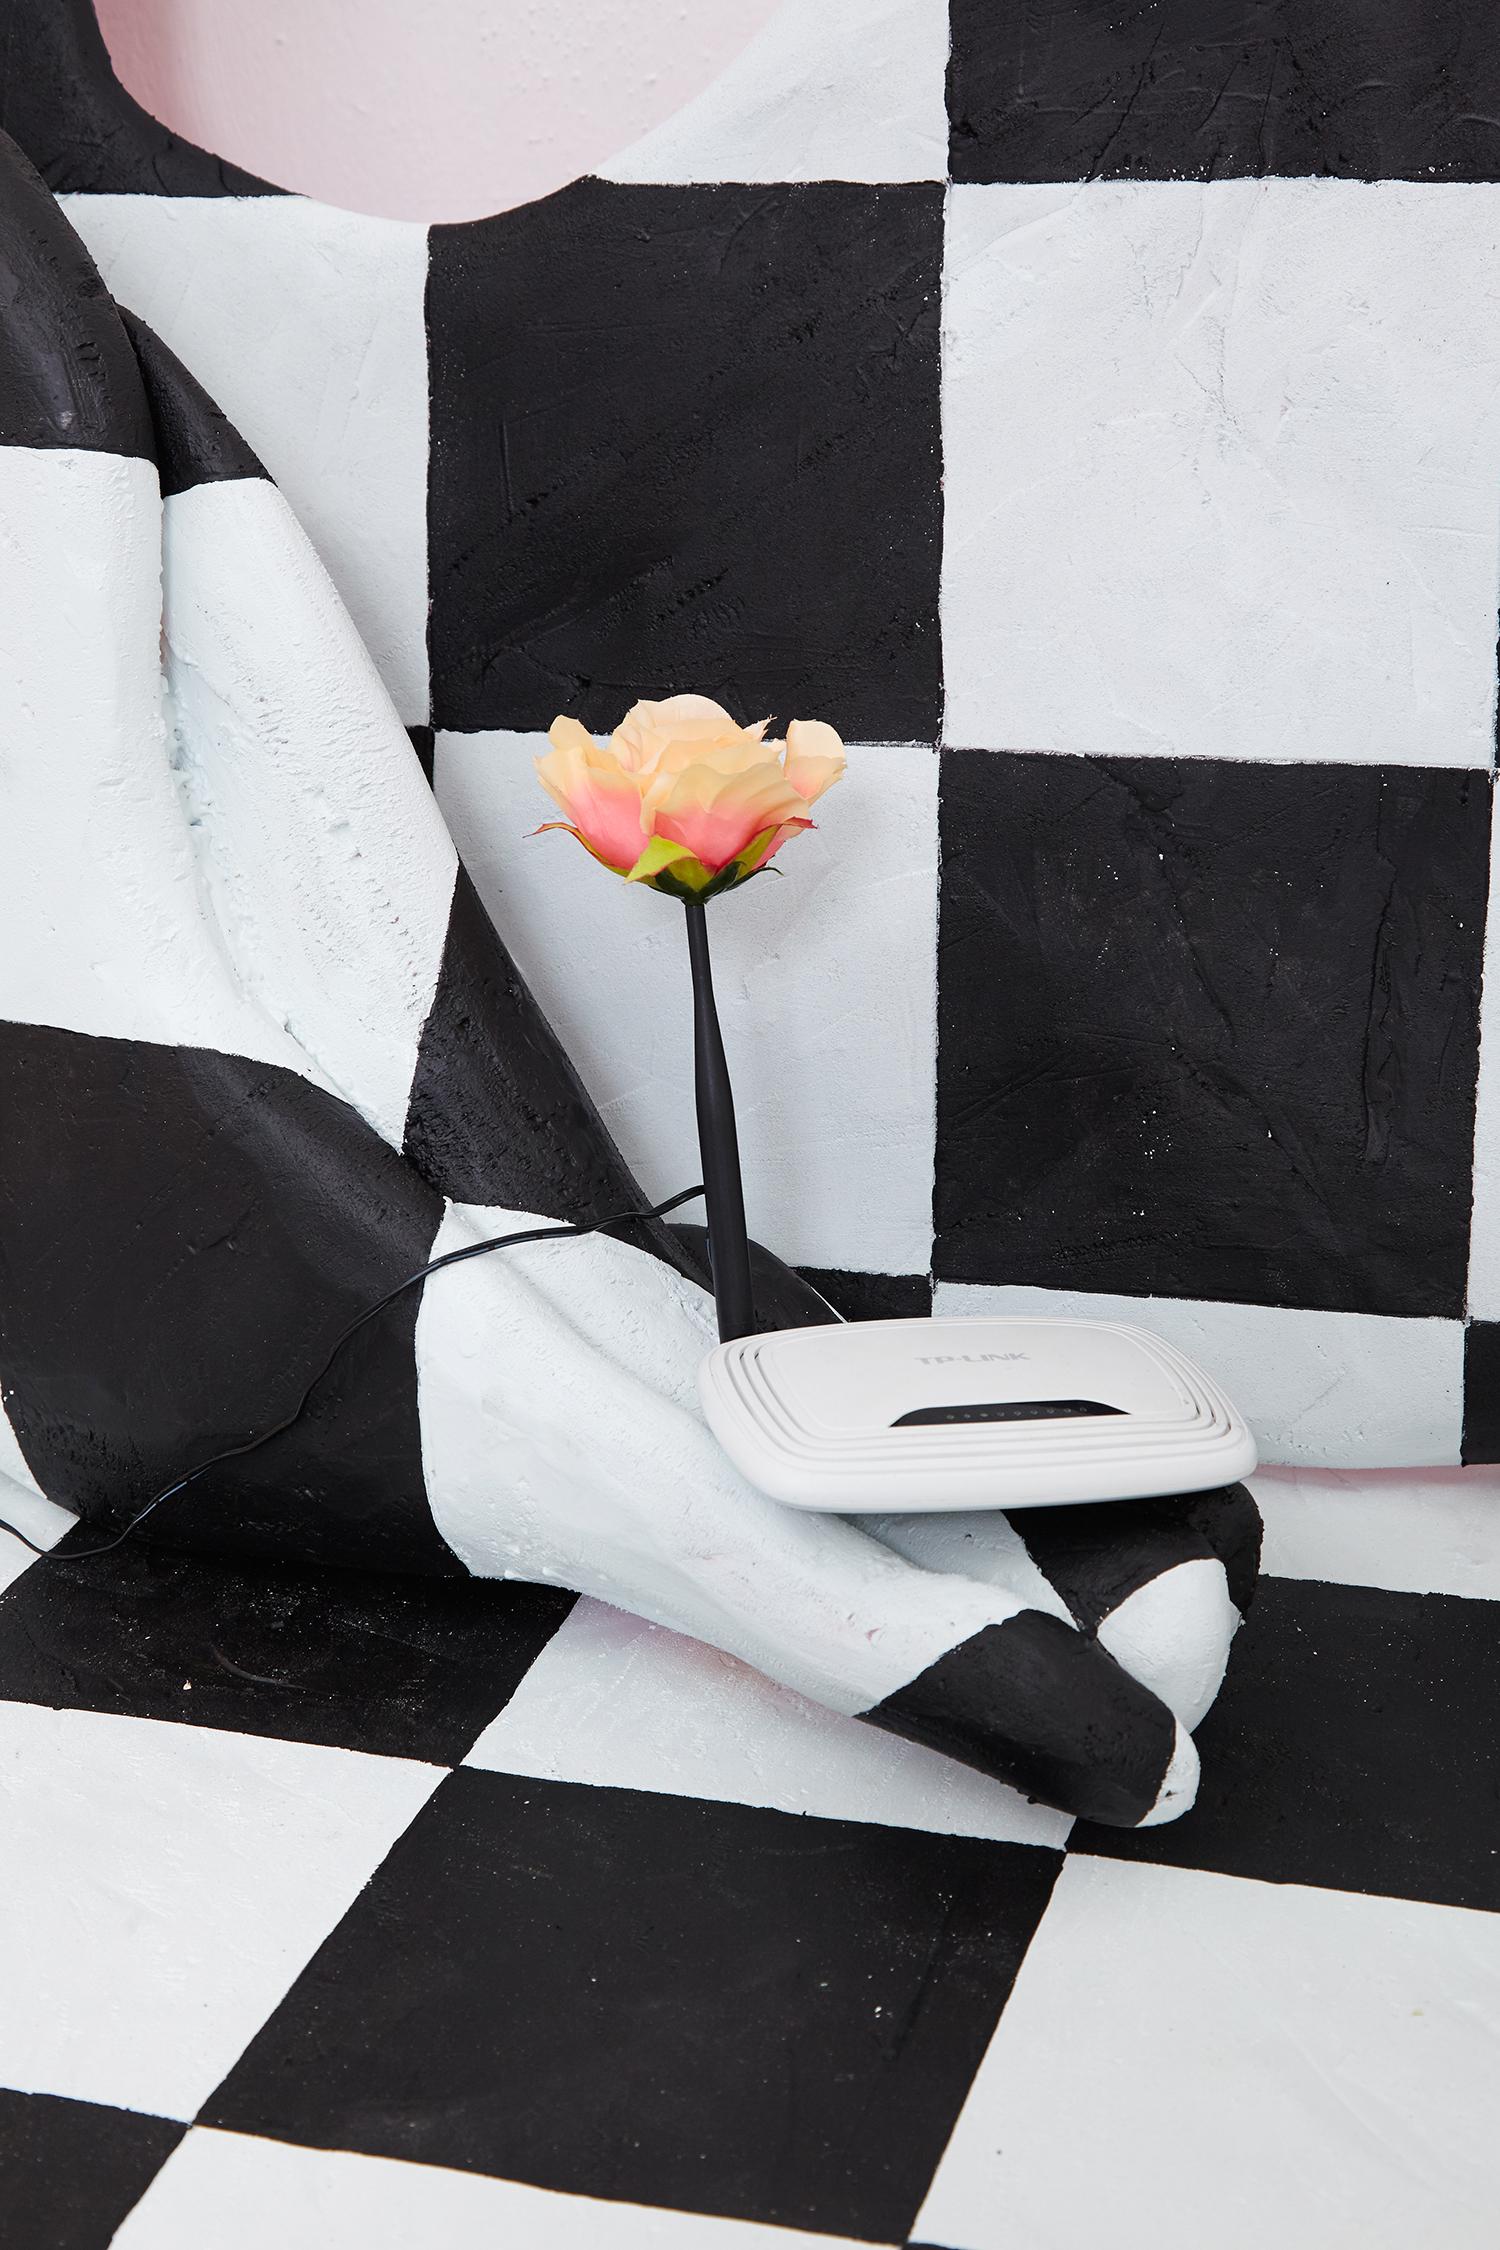 It Wasn't Us Who Told Lizi to Lie Down on the Cold Kitchen Floor, 2016, styrofoam, acrylic paint, router, artifical flower, Macbook box, thread. | Photo: Krisztián Zana.